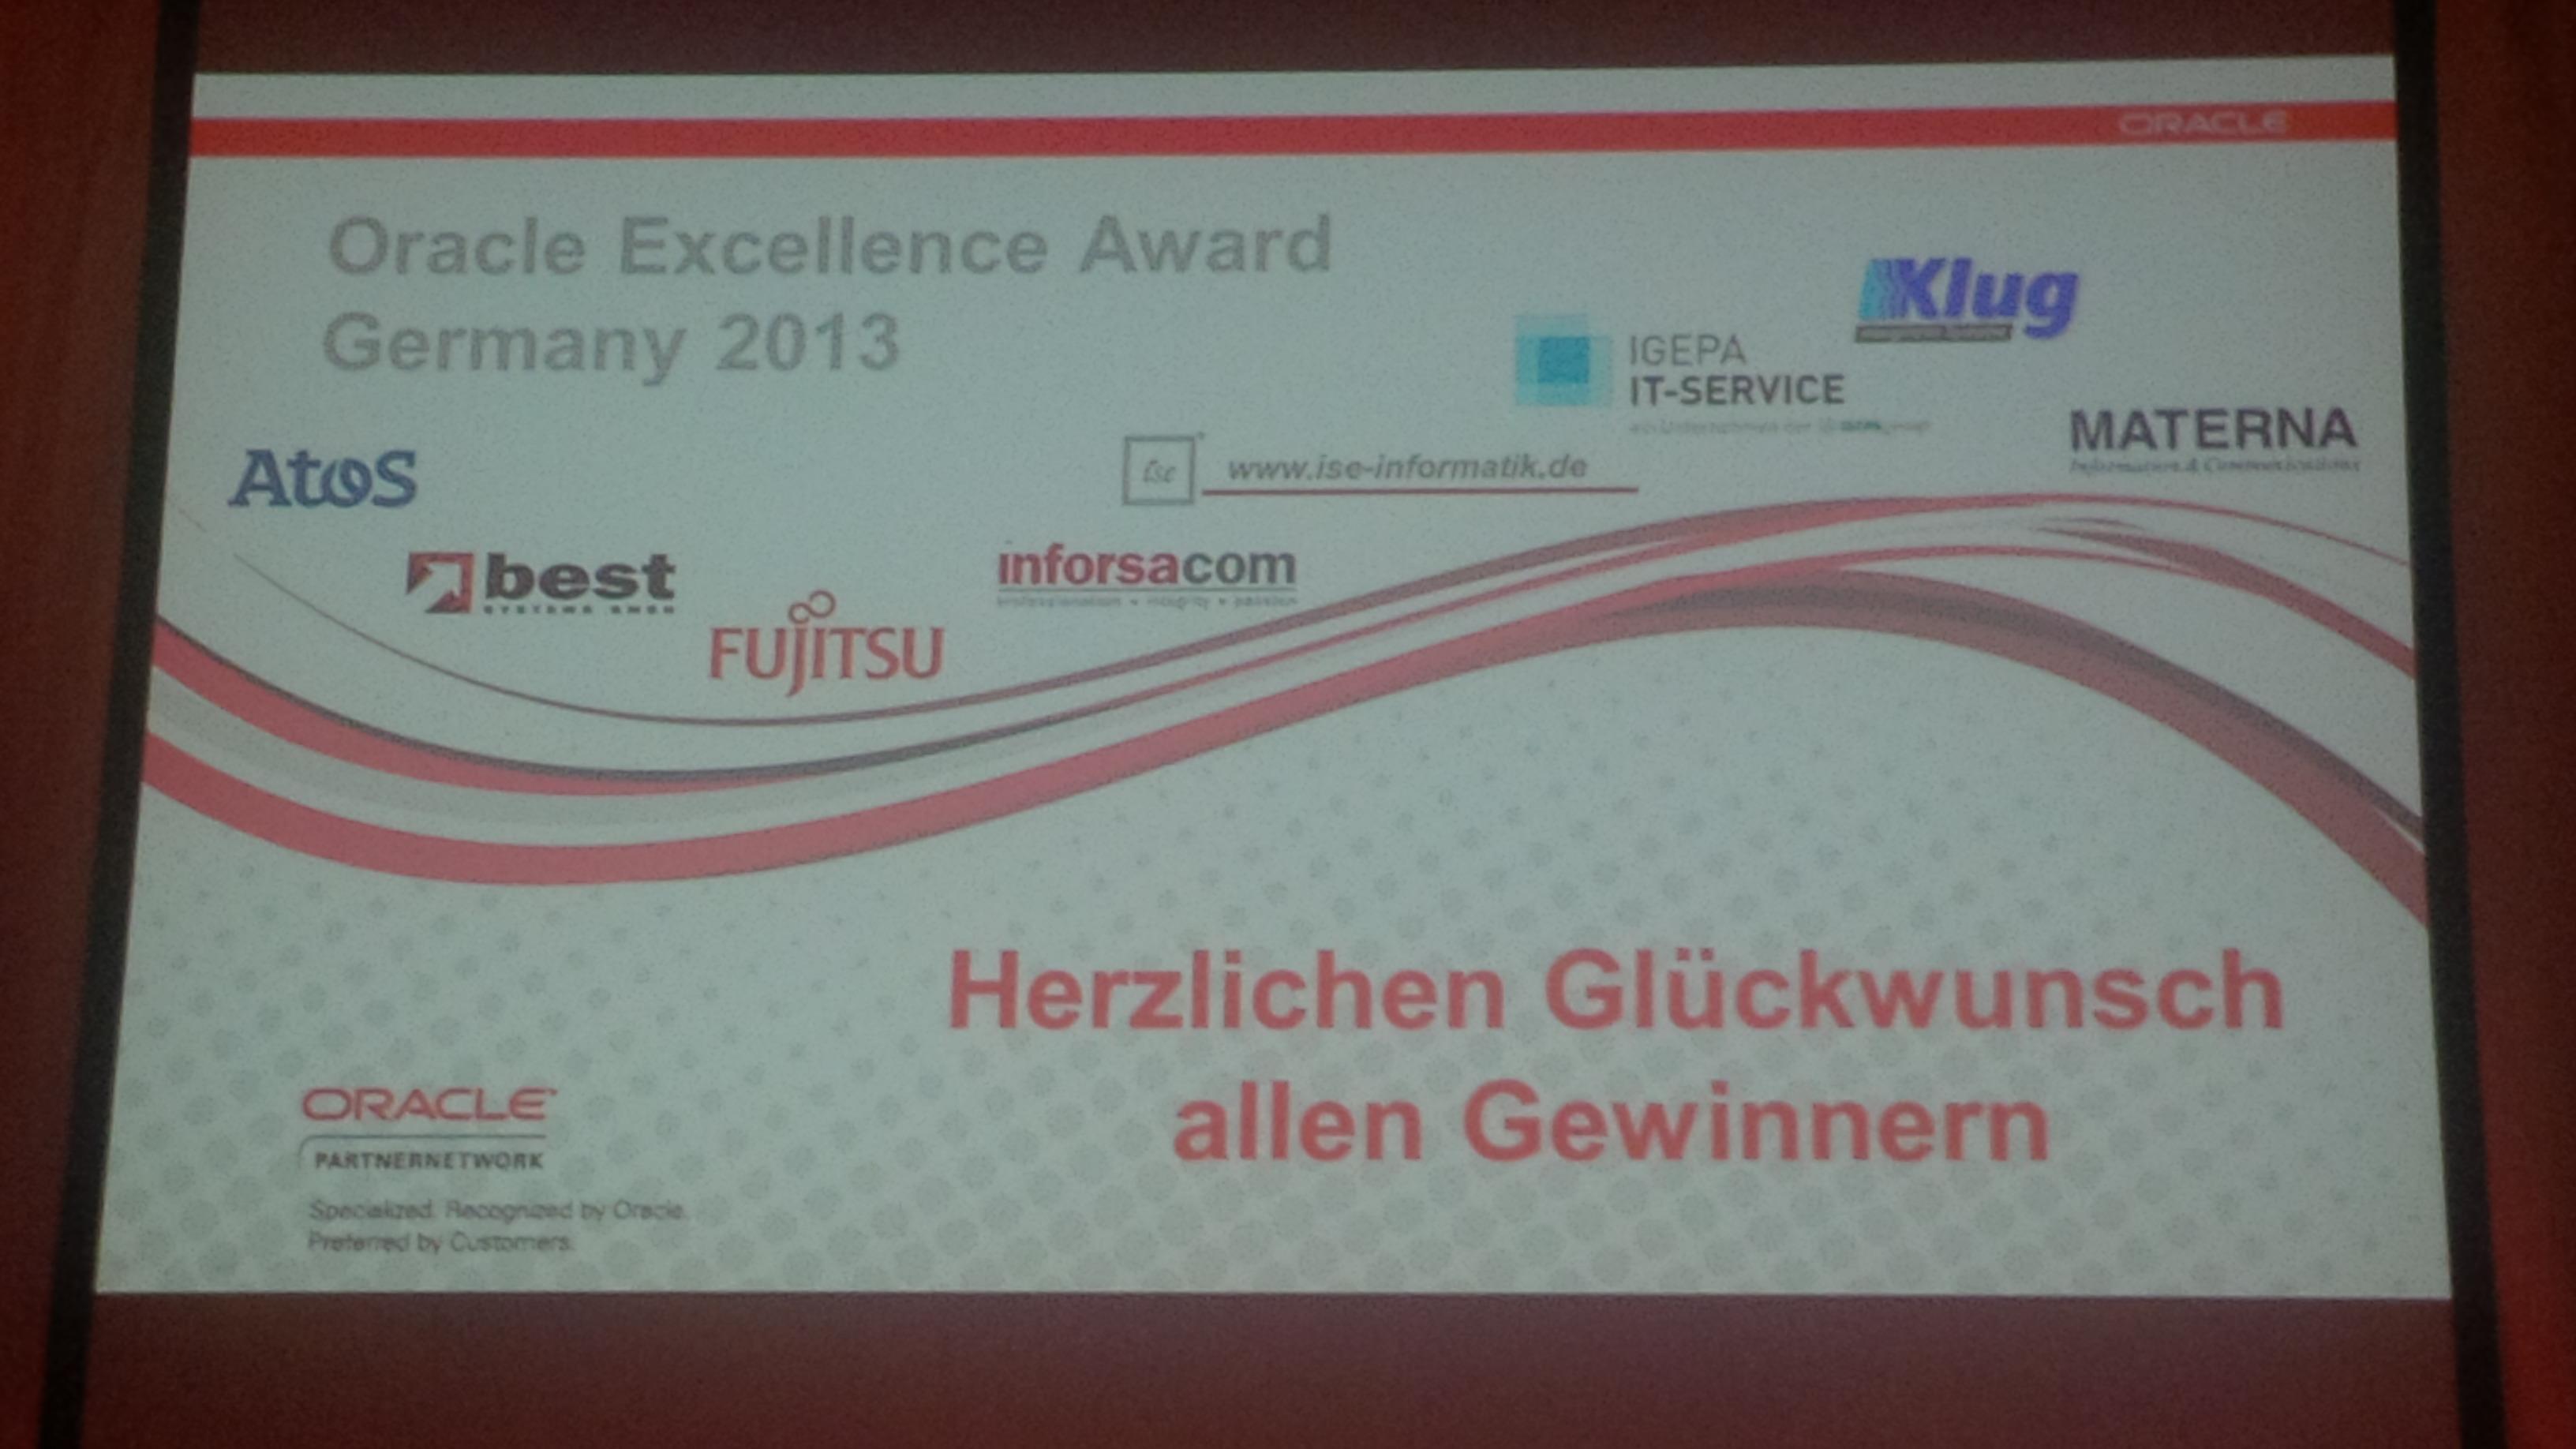 Klug wins Oracle Excellence Award